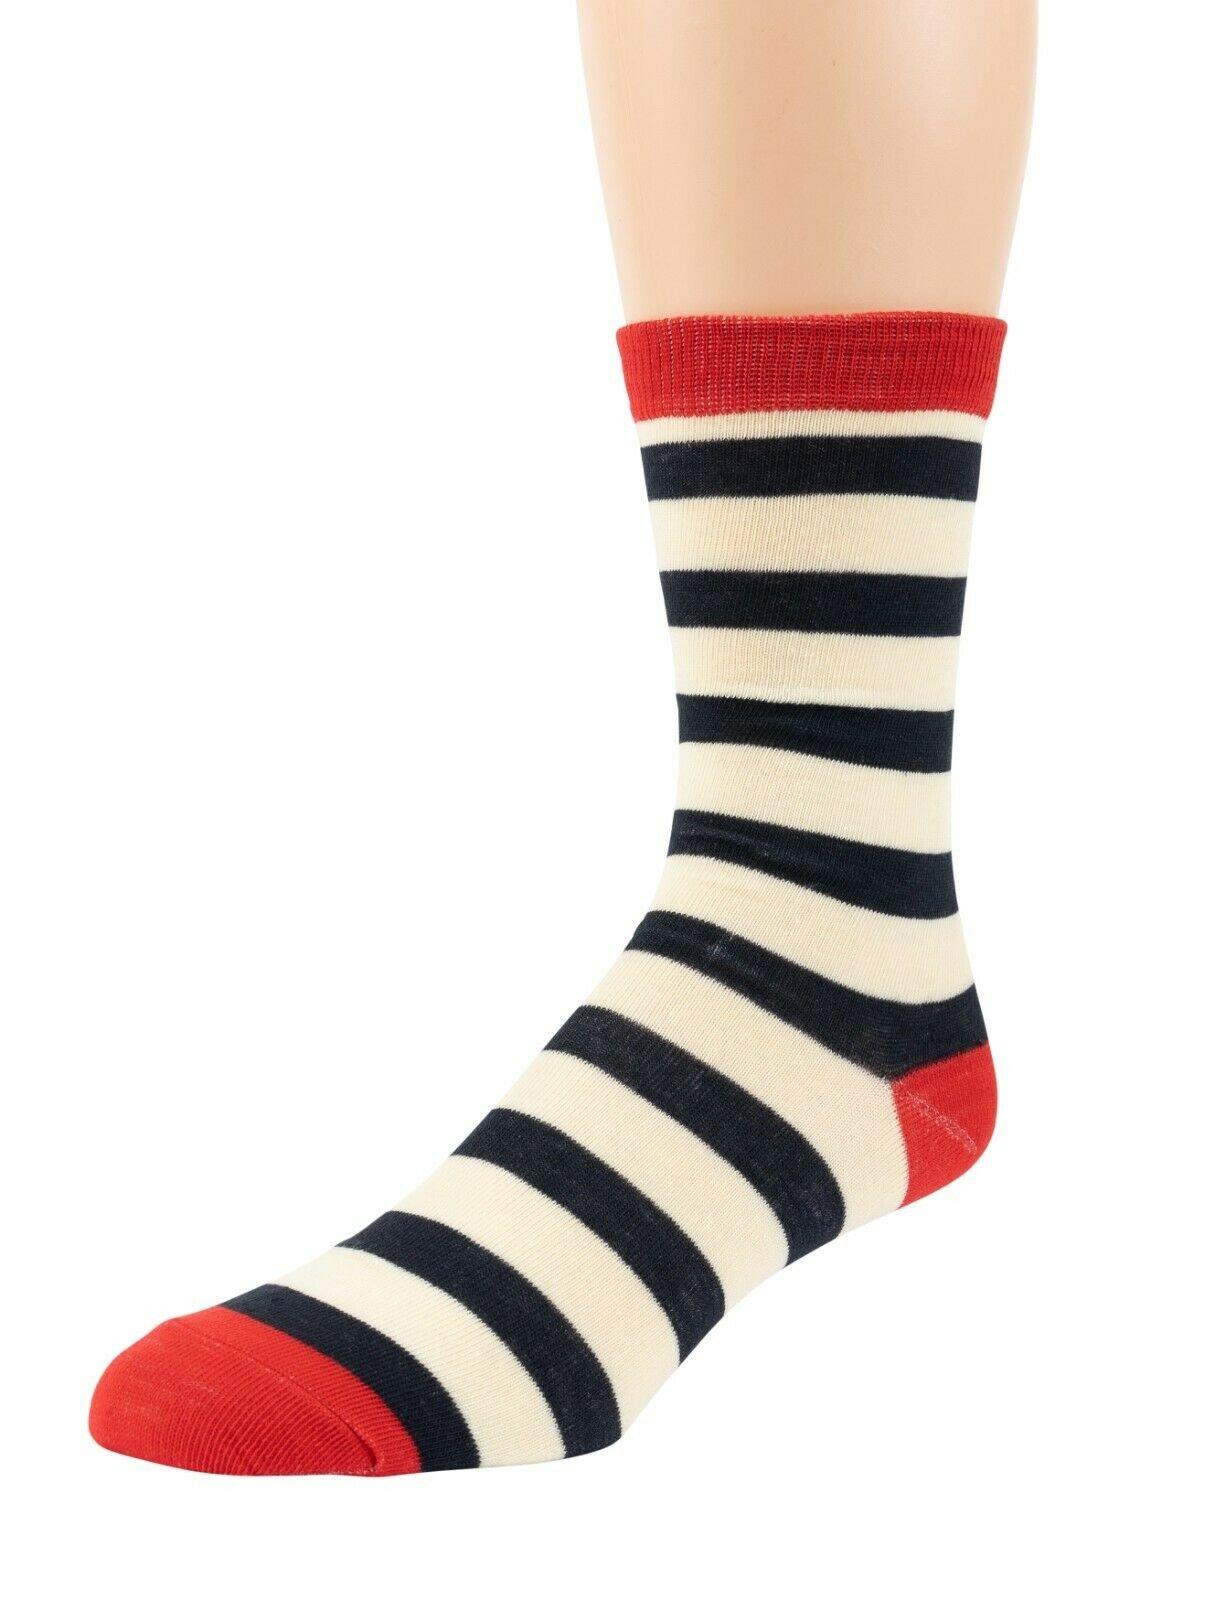 Mitch-Bogen-Mens-Cotton-Dress-Socks-Colorful-Fashion-Crew-Socks-8-Pack-Gift-Box thumbnail 45